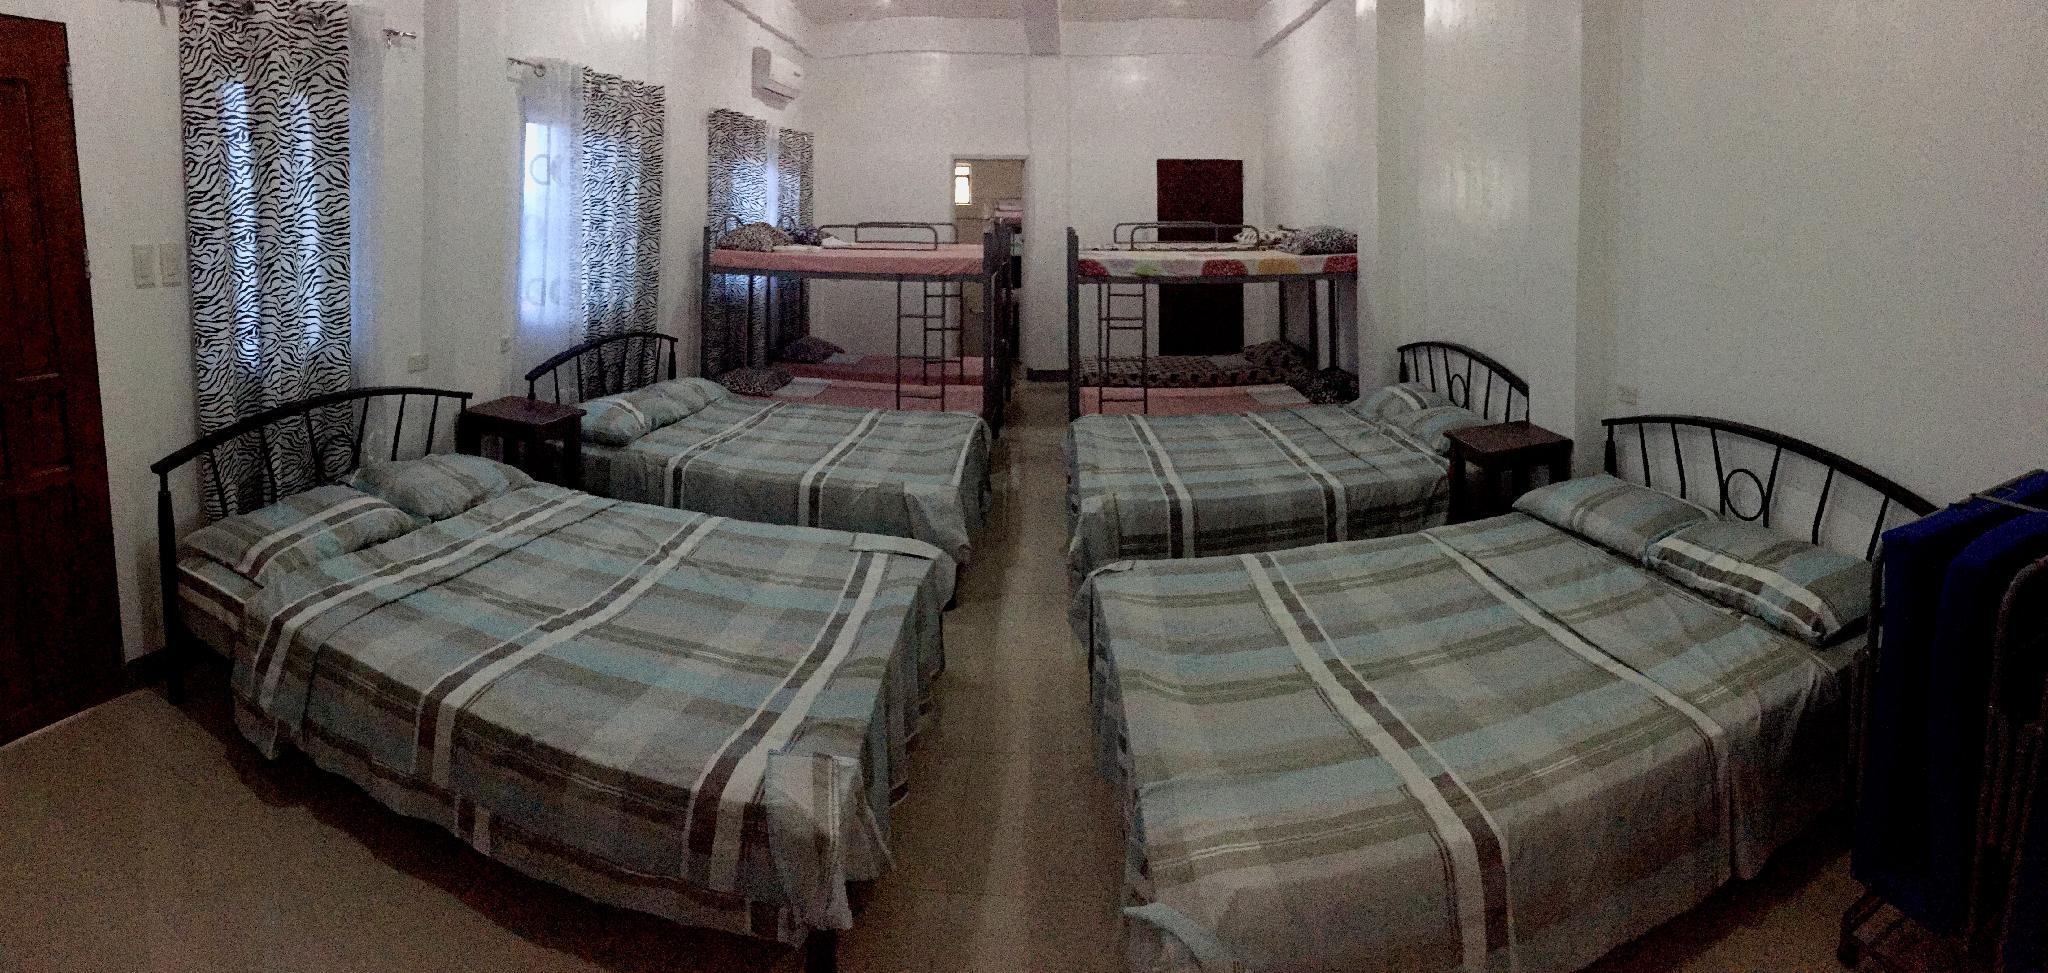 La Esplanada Transient House   Dorm Type